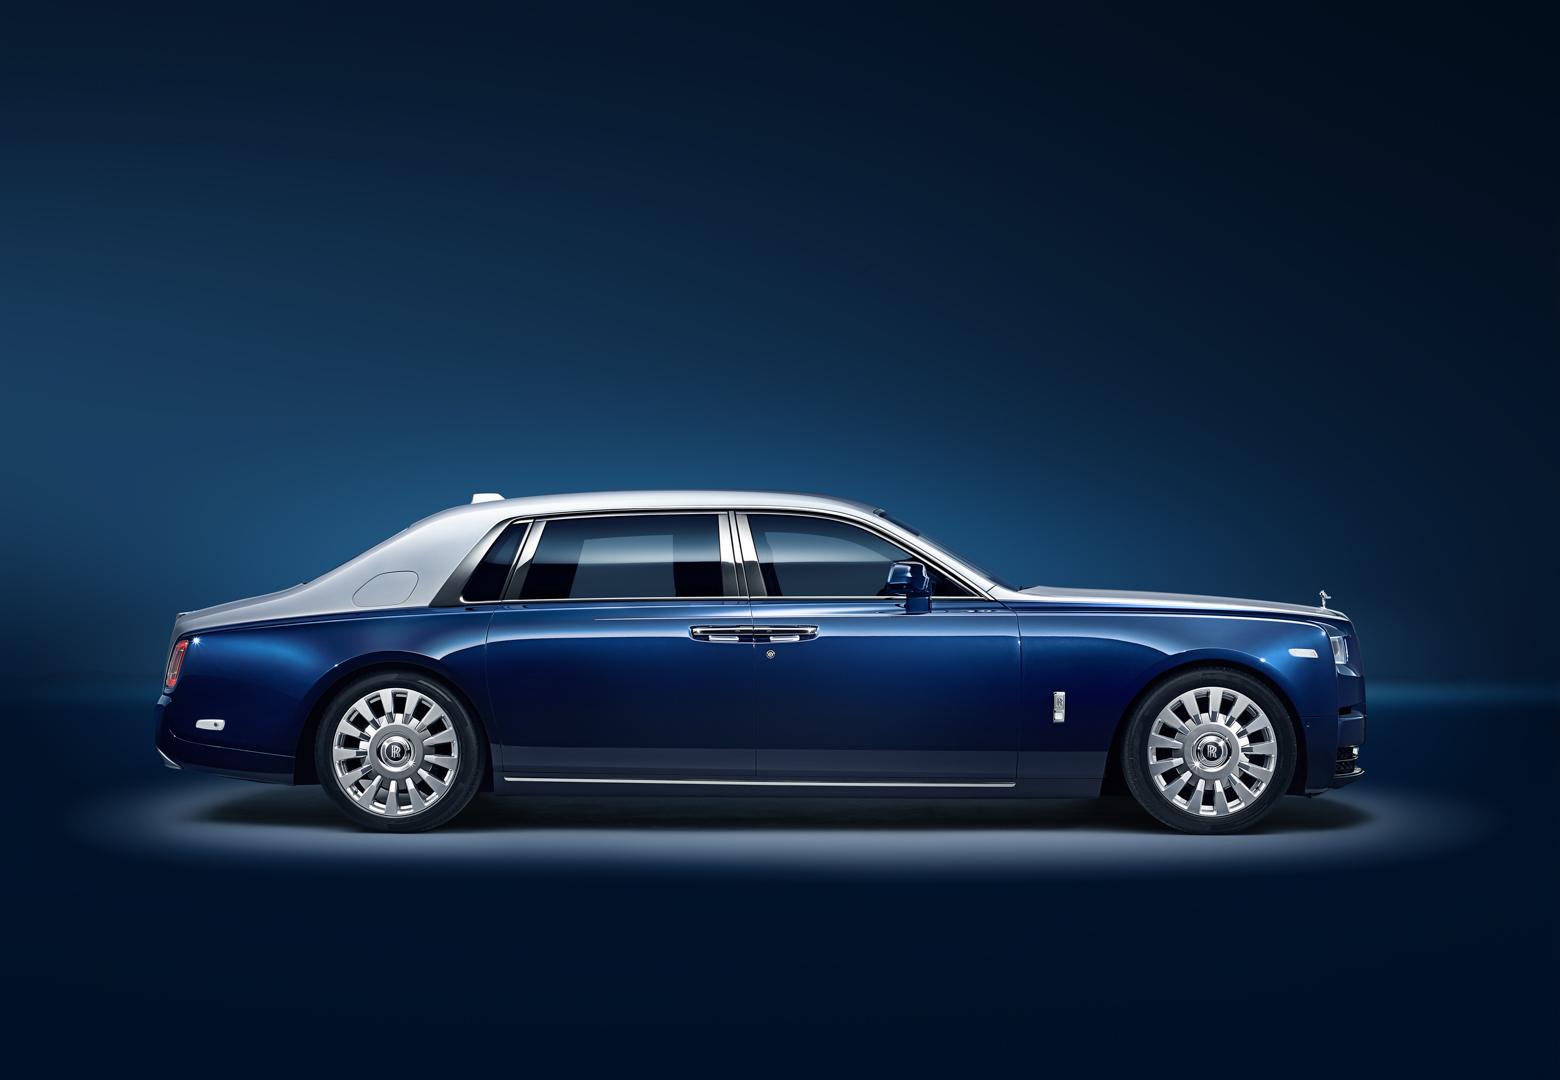 Video Carwow Tests The Rolls Royce Phantom Viii